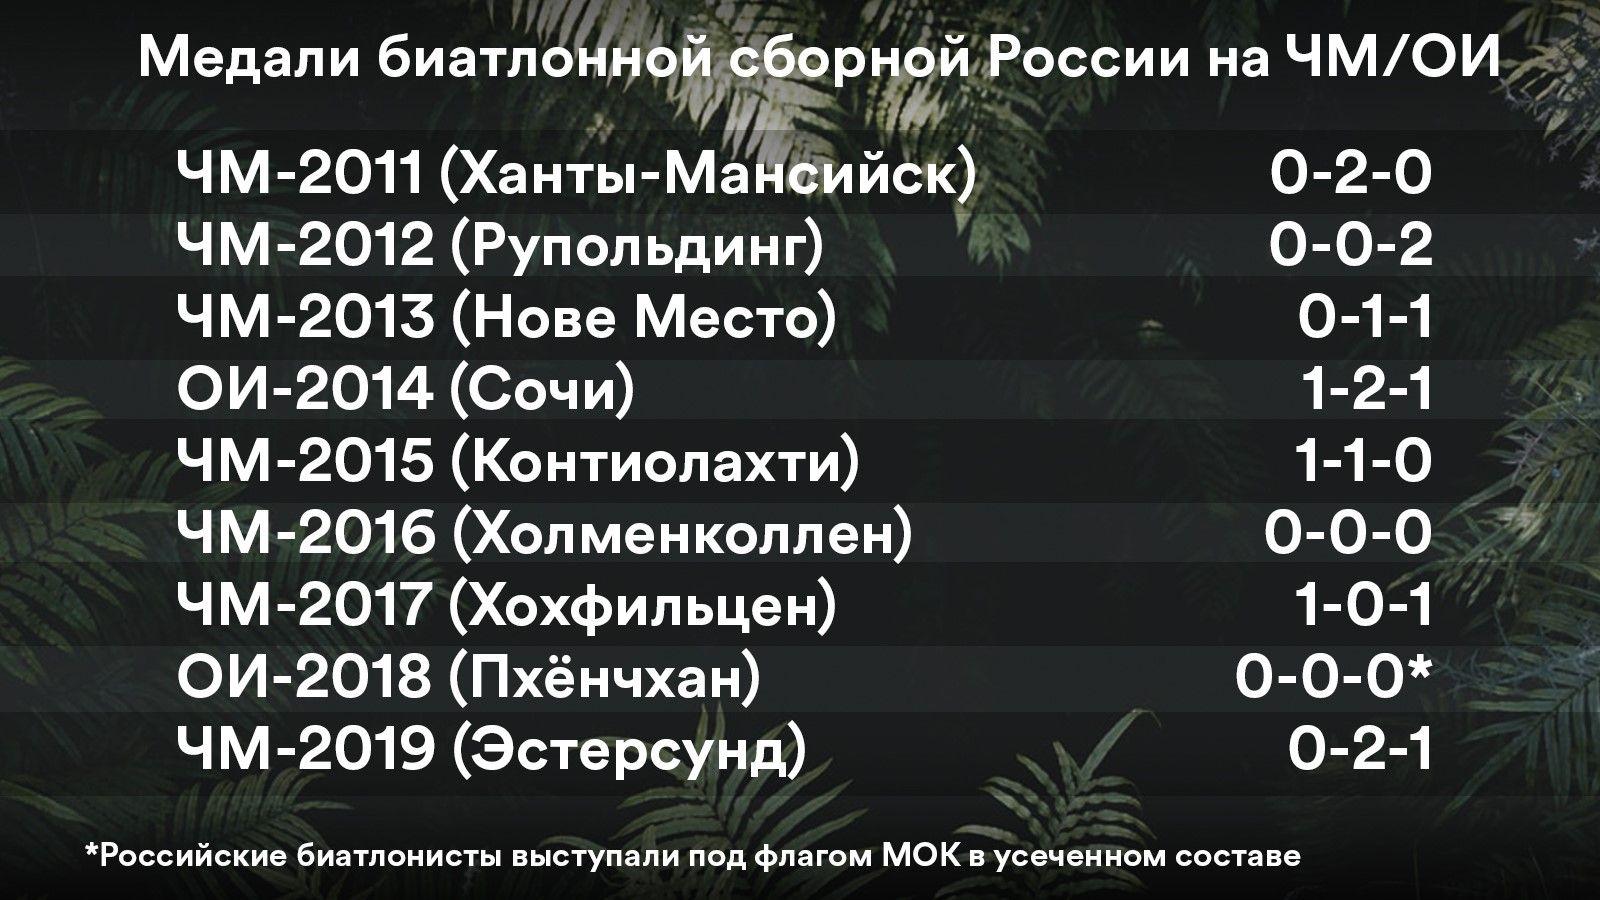 https://imgresizer.eurosport.com/unsafe/0x0/filters:format(jpeg):focal(1021x577:1023x575)/origin-imgresizer.eurosport.com/2020/01/24/2760478.jpg